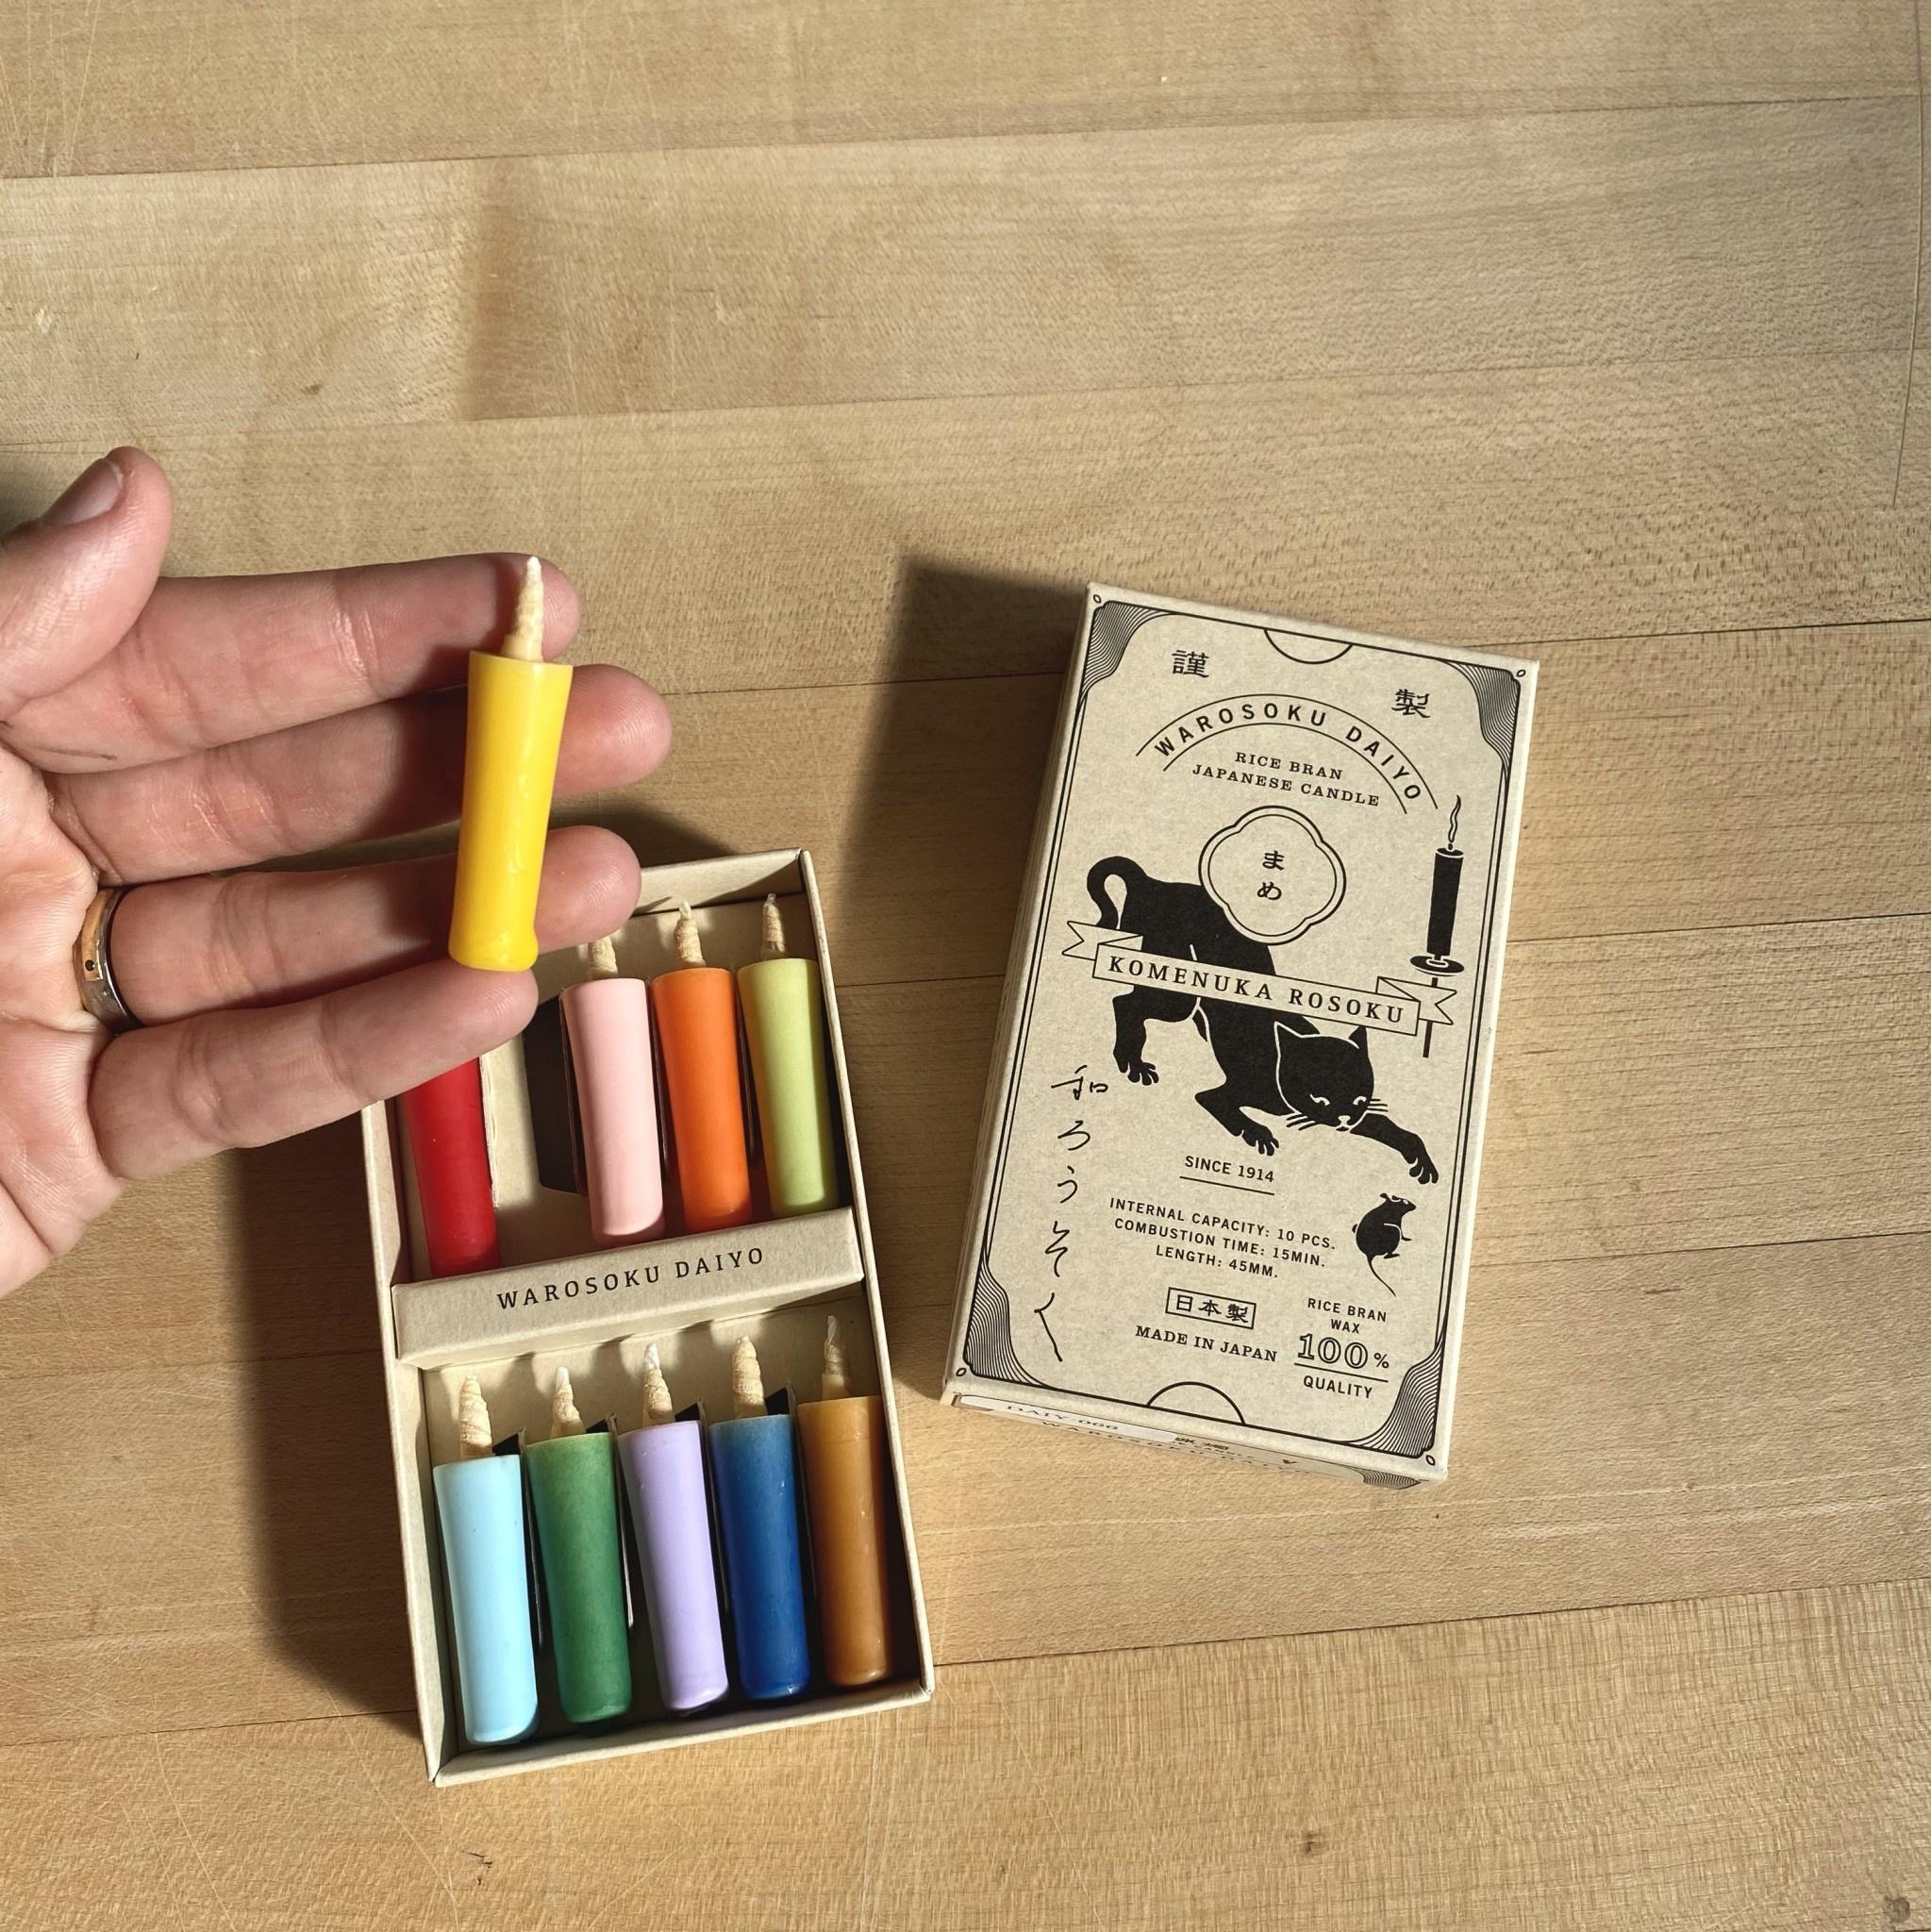 Tiny Rice Wax Candle Set - Vivid Colors